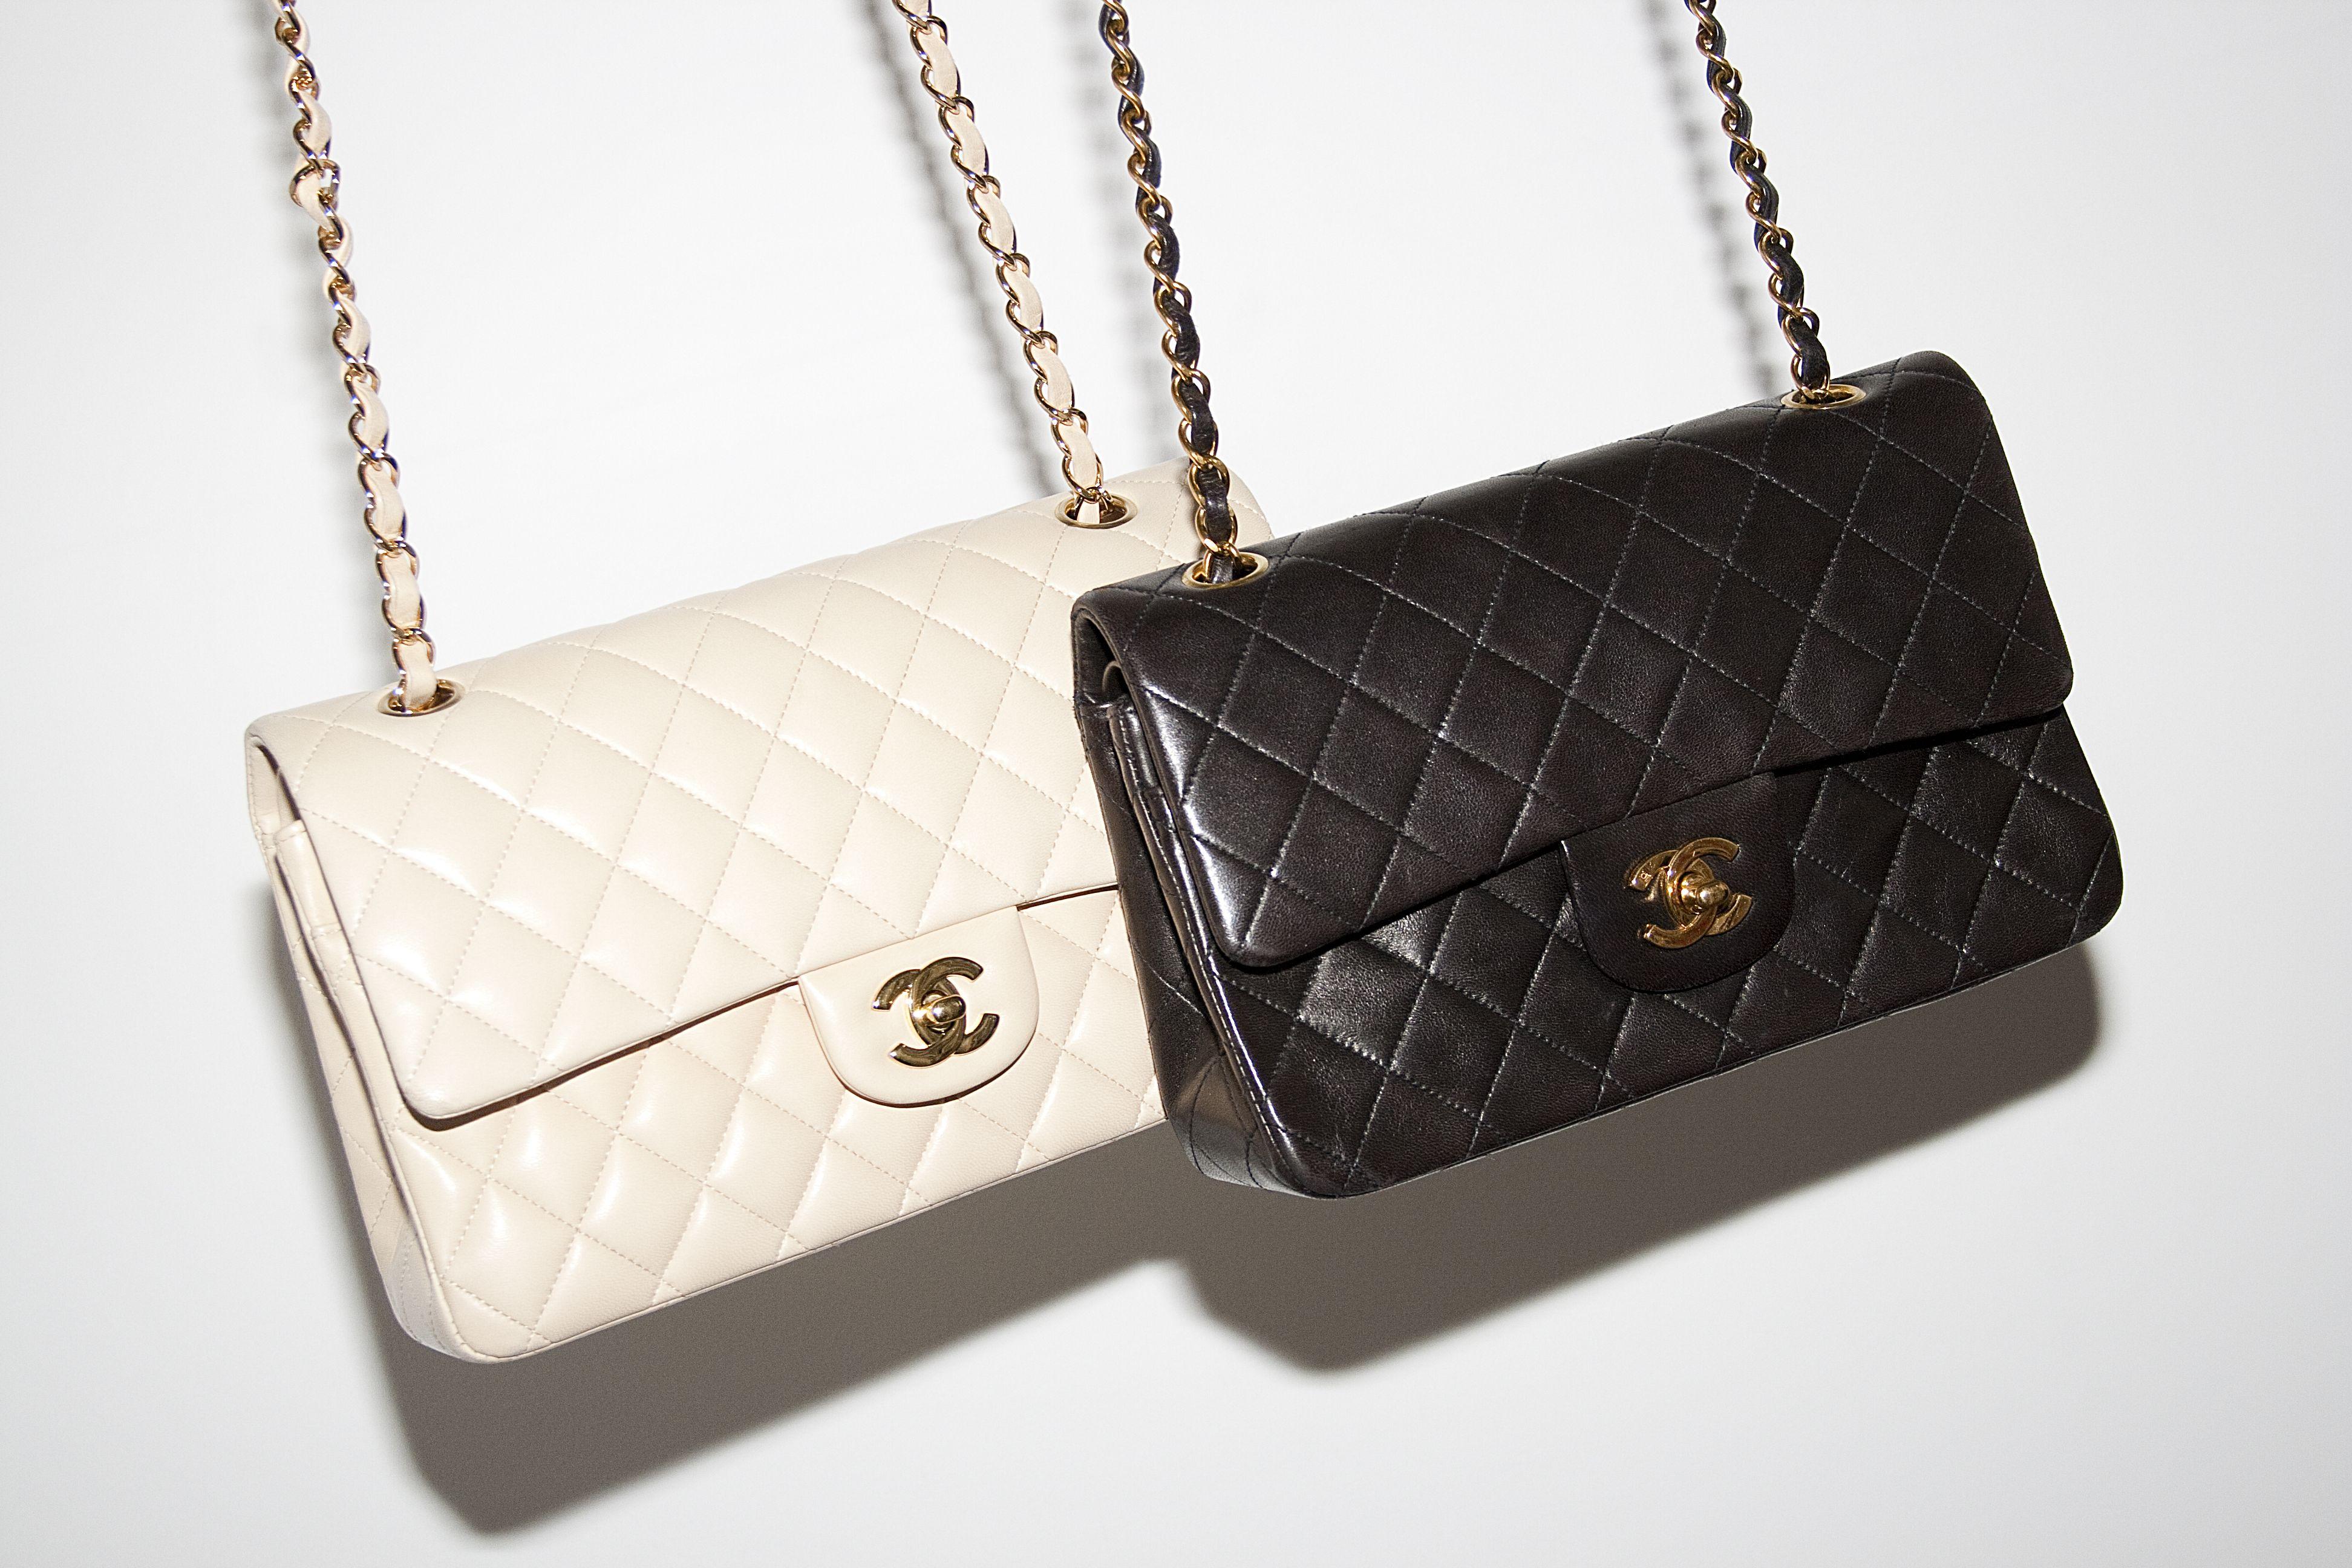 e4df4348a148 Discover thousands of designer handbags with up to 70% off RRP ...